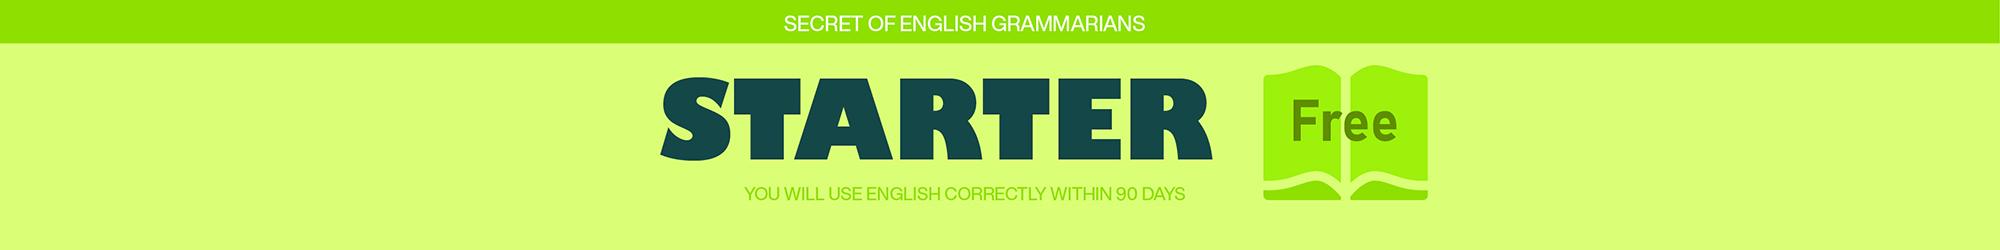 ENGLISH GRAMMAR FOR STARTER banner